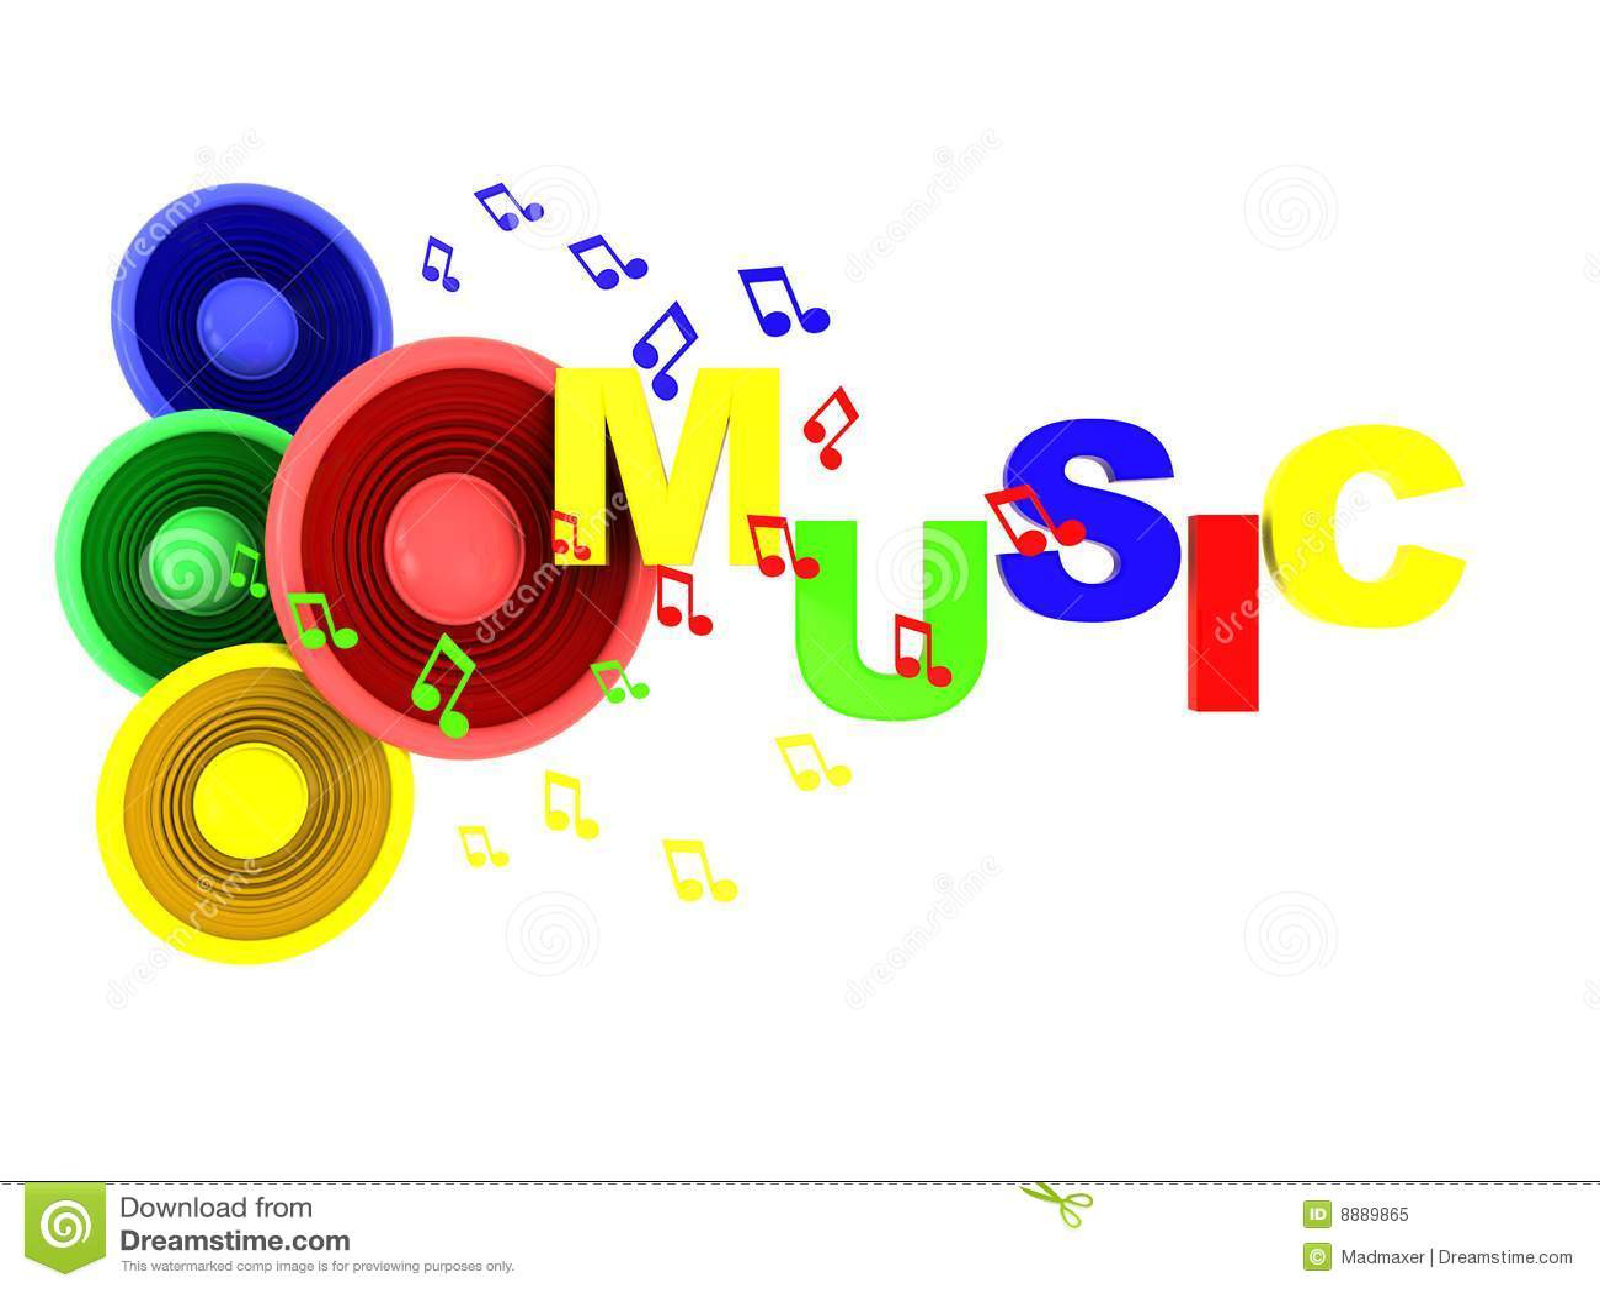 symbol music sign musik musikzeichen oder het symbool teken muziek royalty sound abbildung lizenzfreies stockfoto loud